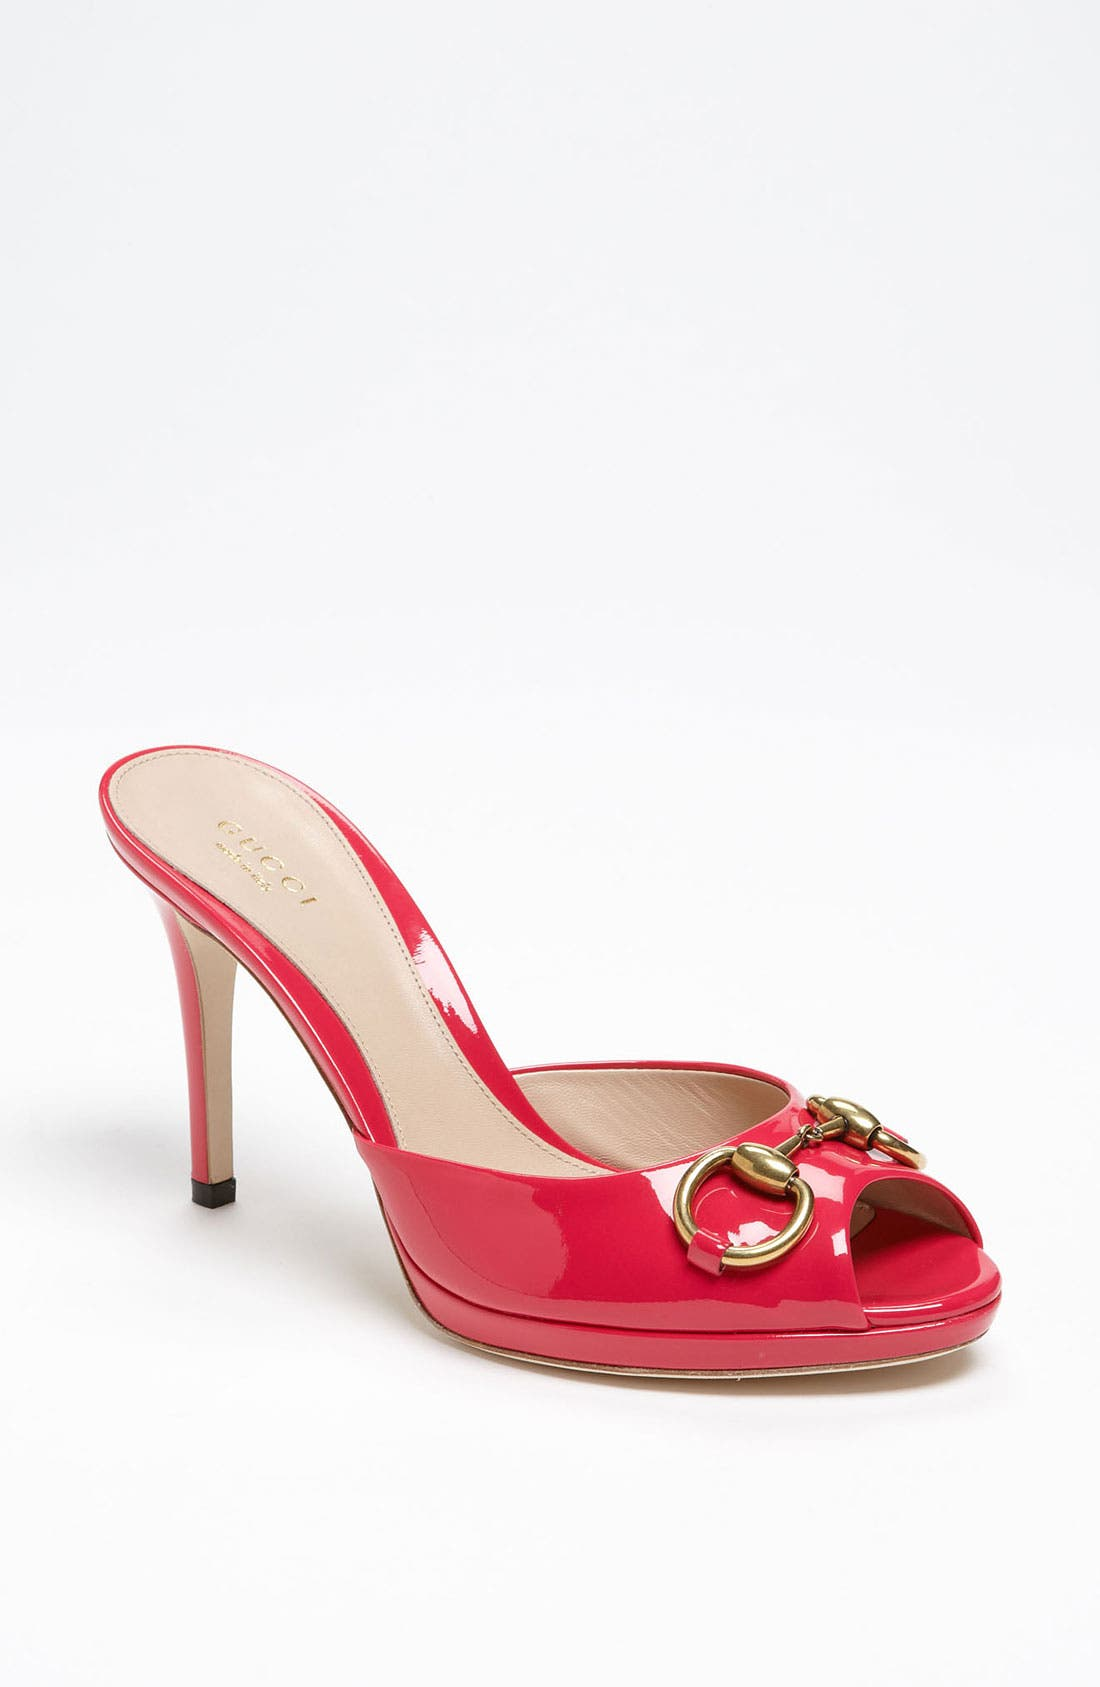 Alternate Image 1 Selected - Gucci 'New Hollywood' Slide Sandal